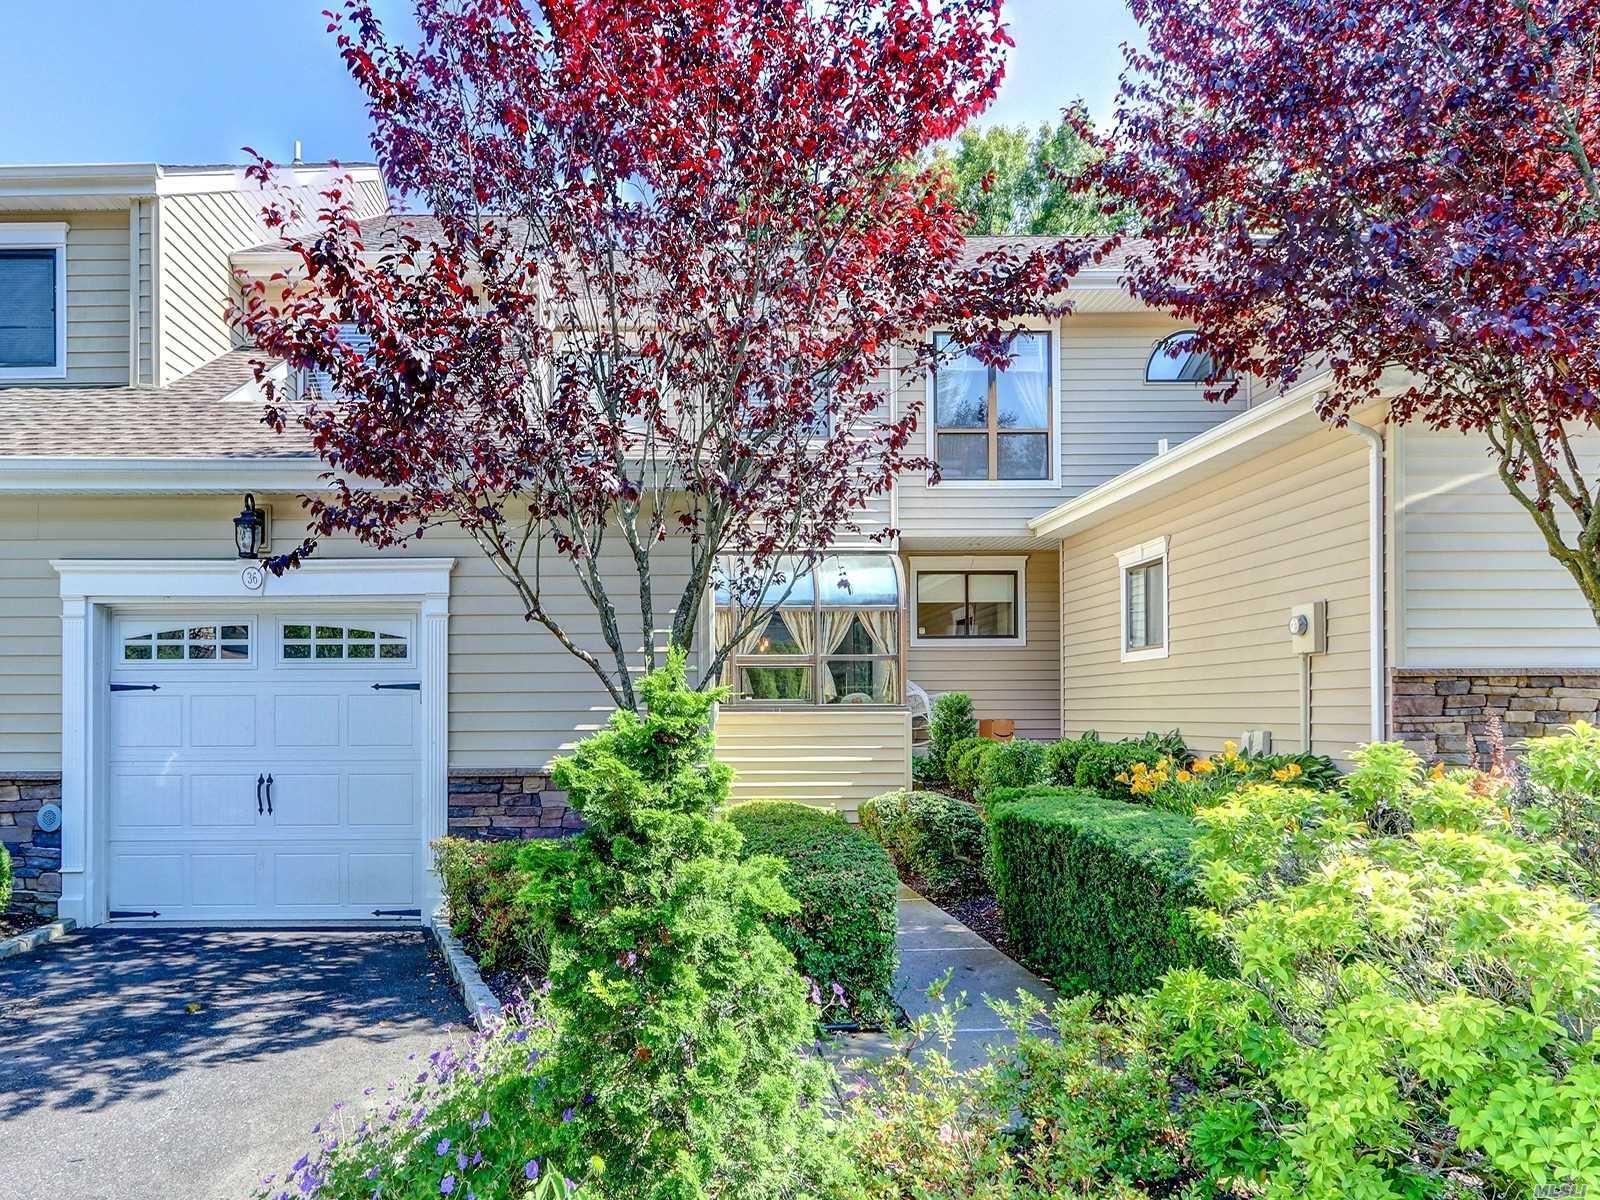 36 Villas Circle, Melville, NY 11747 - MLS#: 3226336